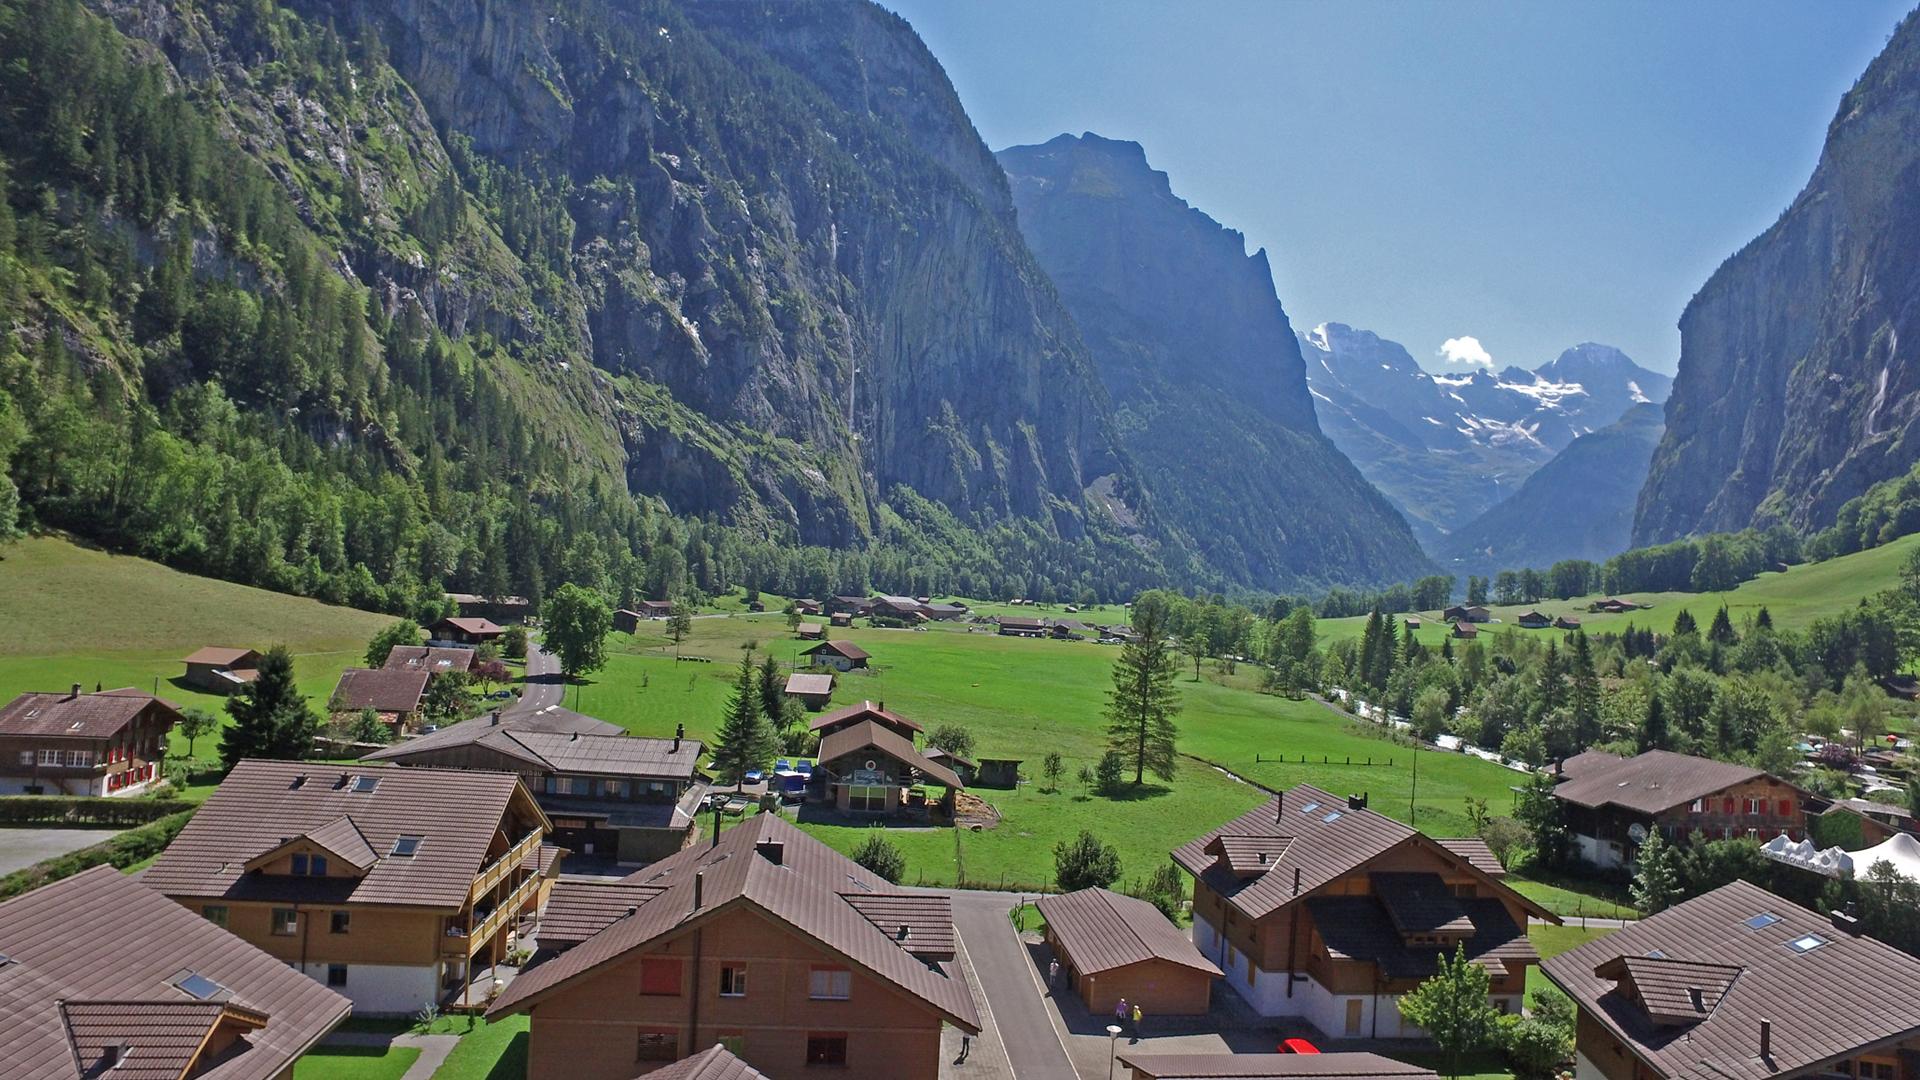 Chalet Edelweiss Apartments, Switzerland